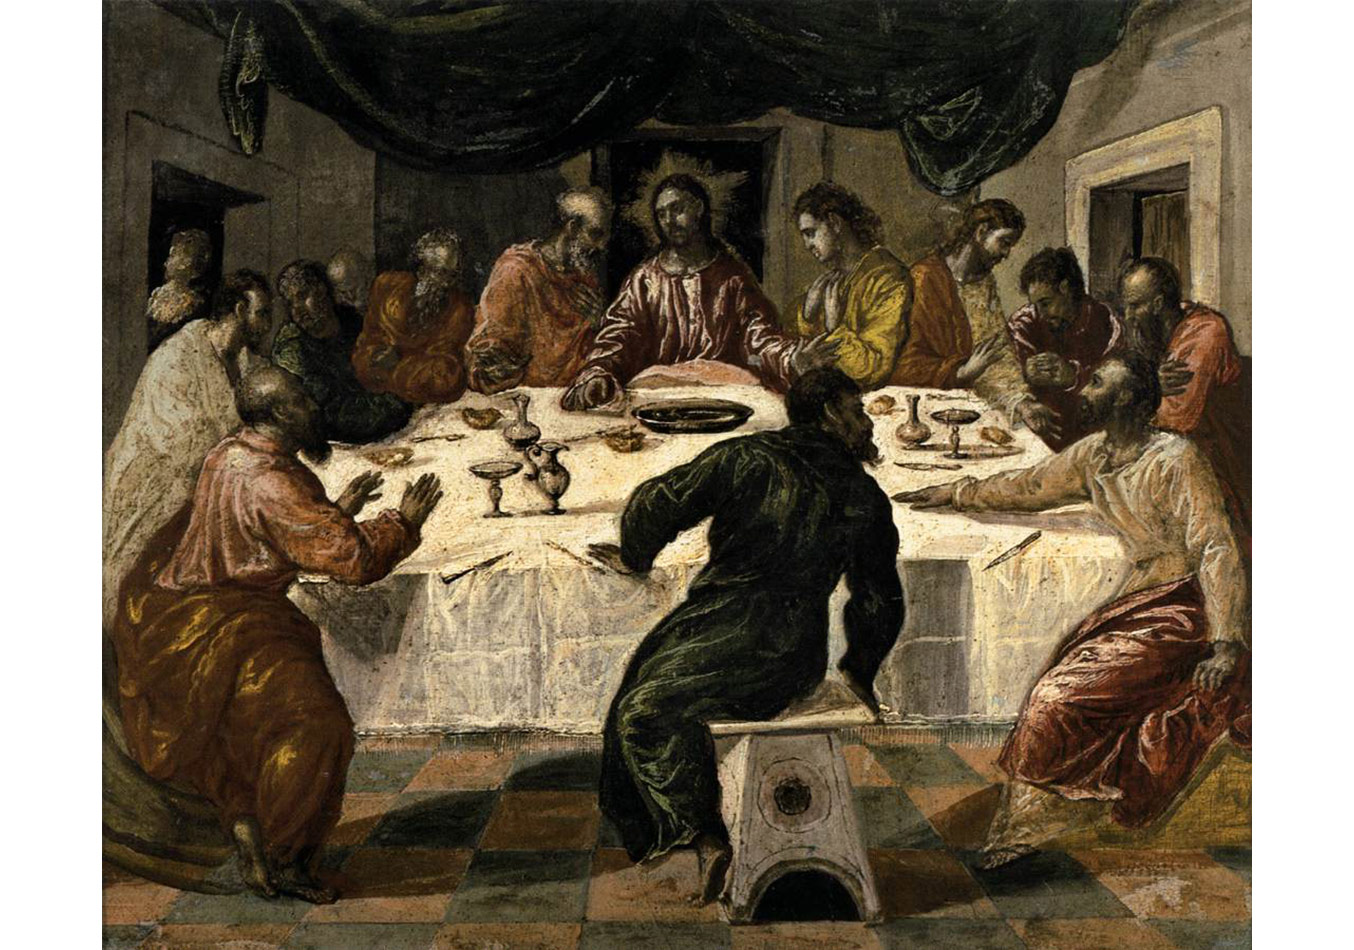 El Greco,Son Akşam Yemeği,1568, ahşap üzerine yağlıboya, 43 x 52 cm, Pinacoteca Nazionale, Bologna